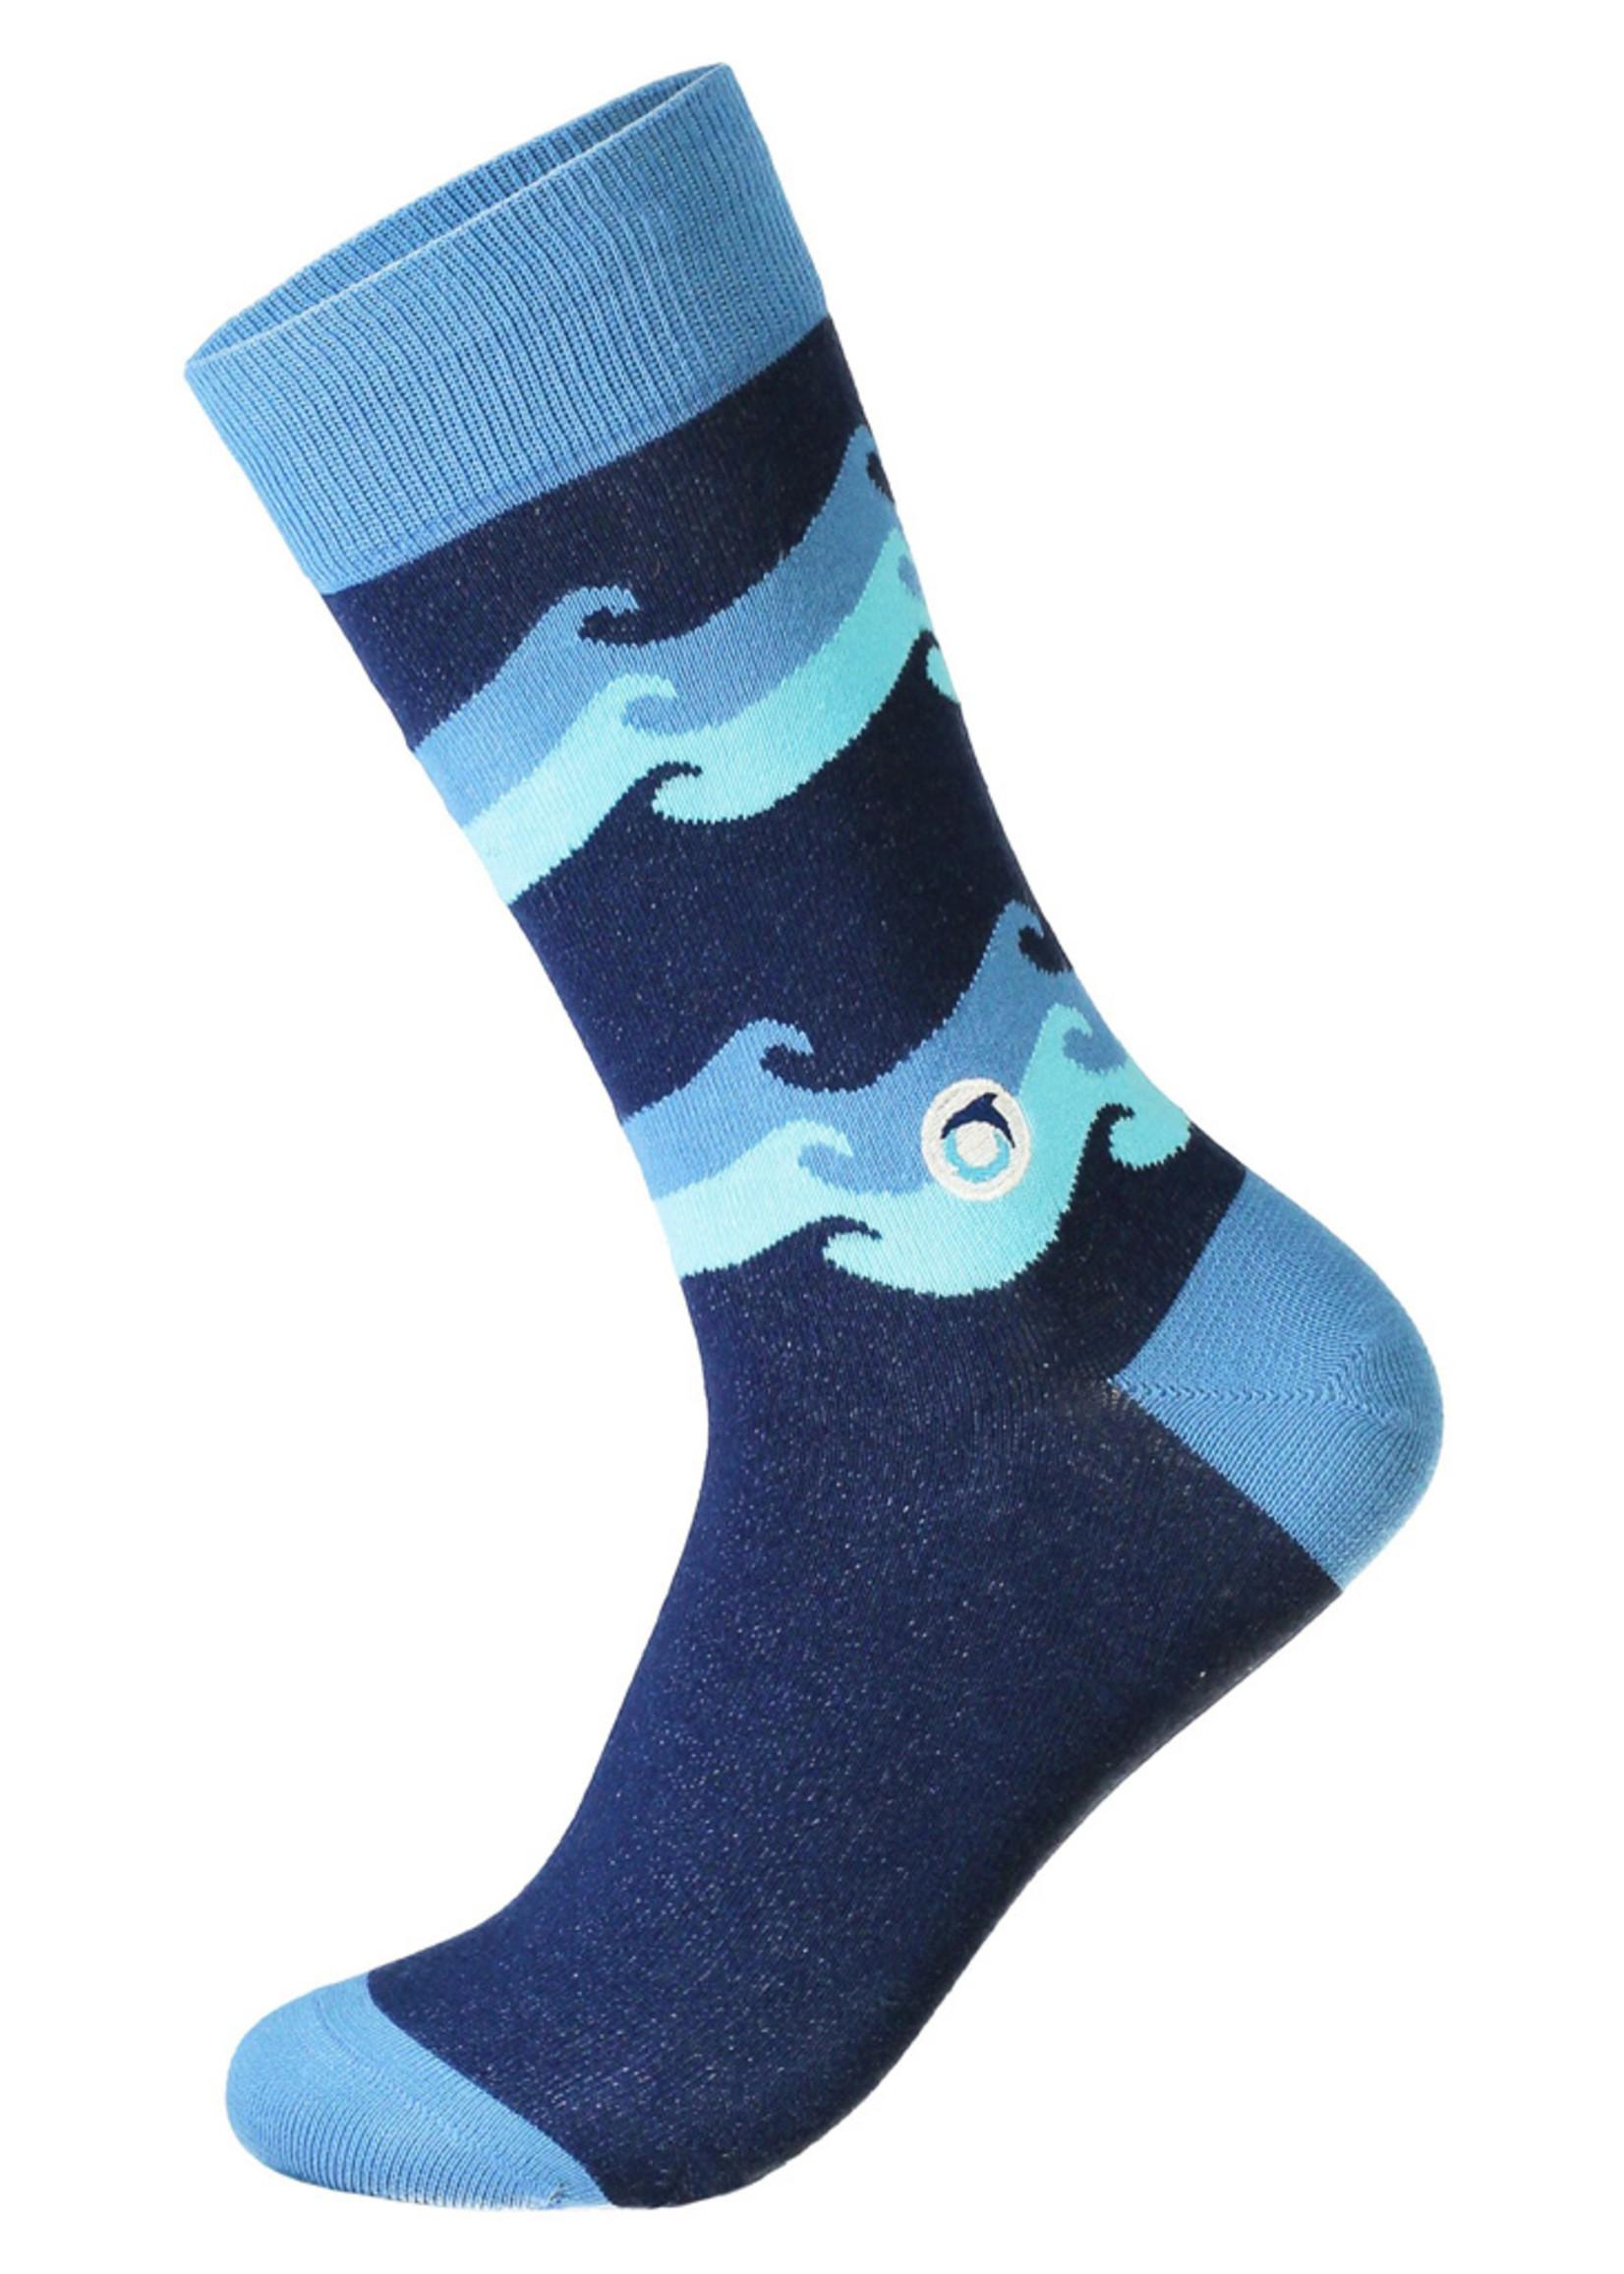 Socks That Protect the Ocean (men's)